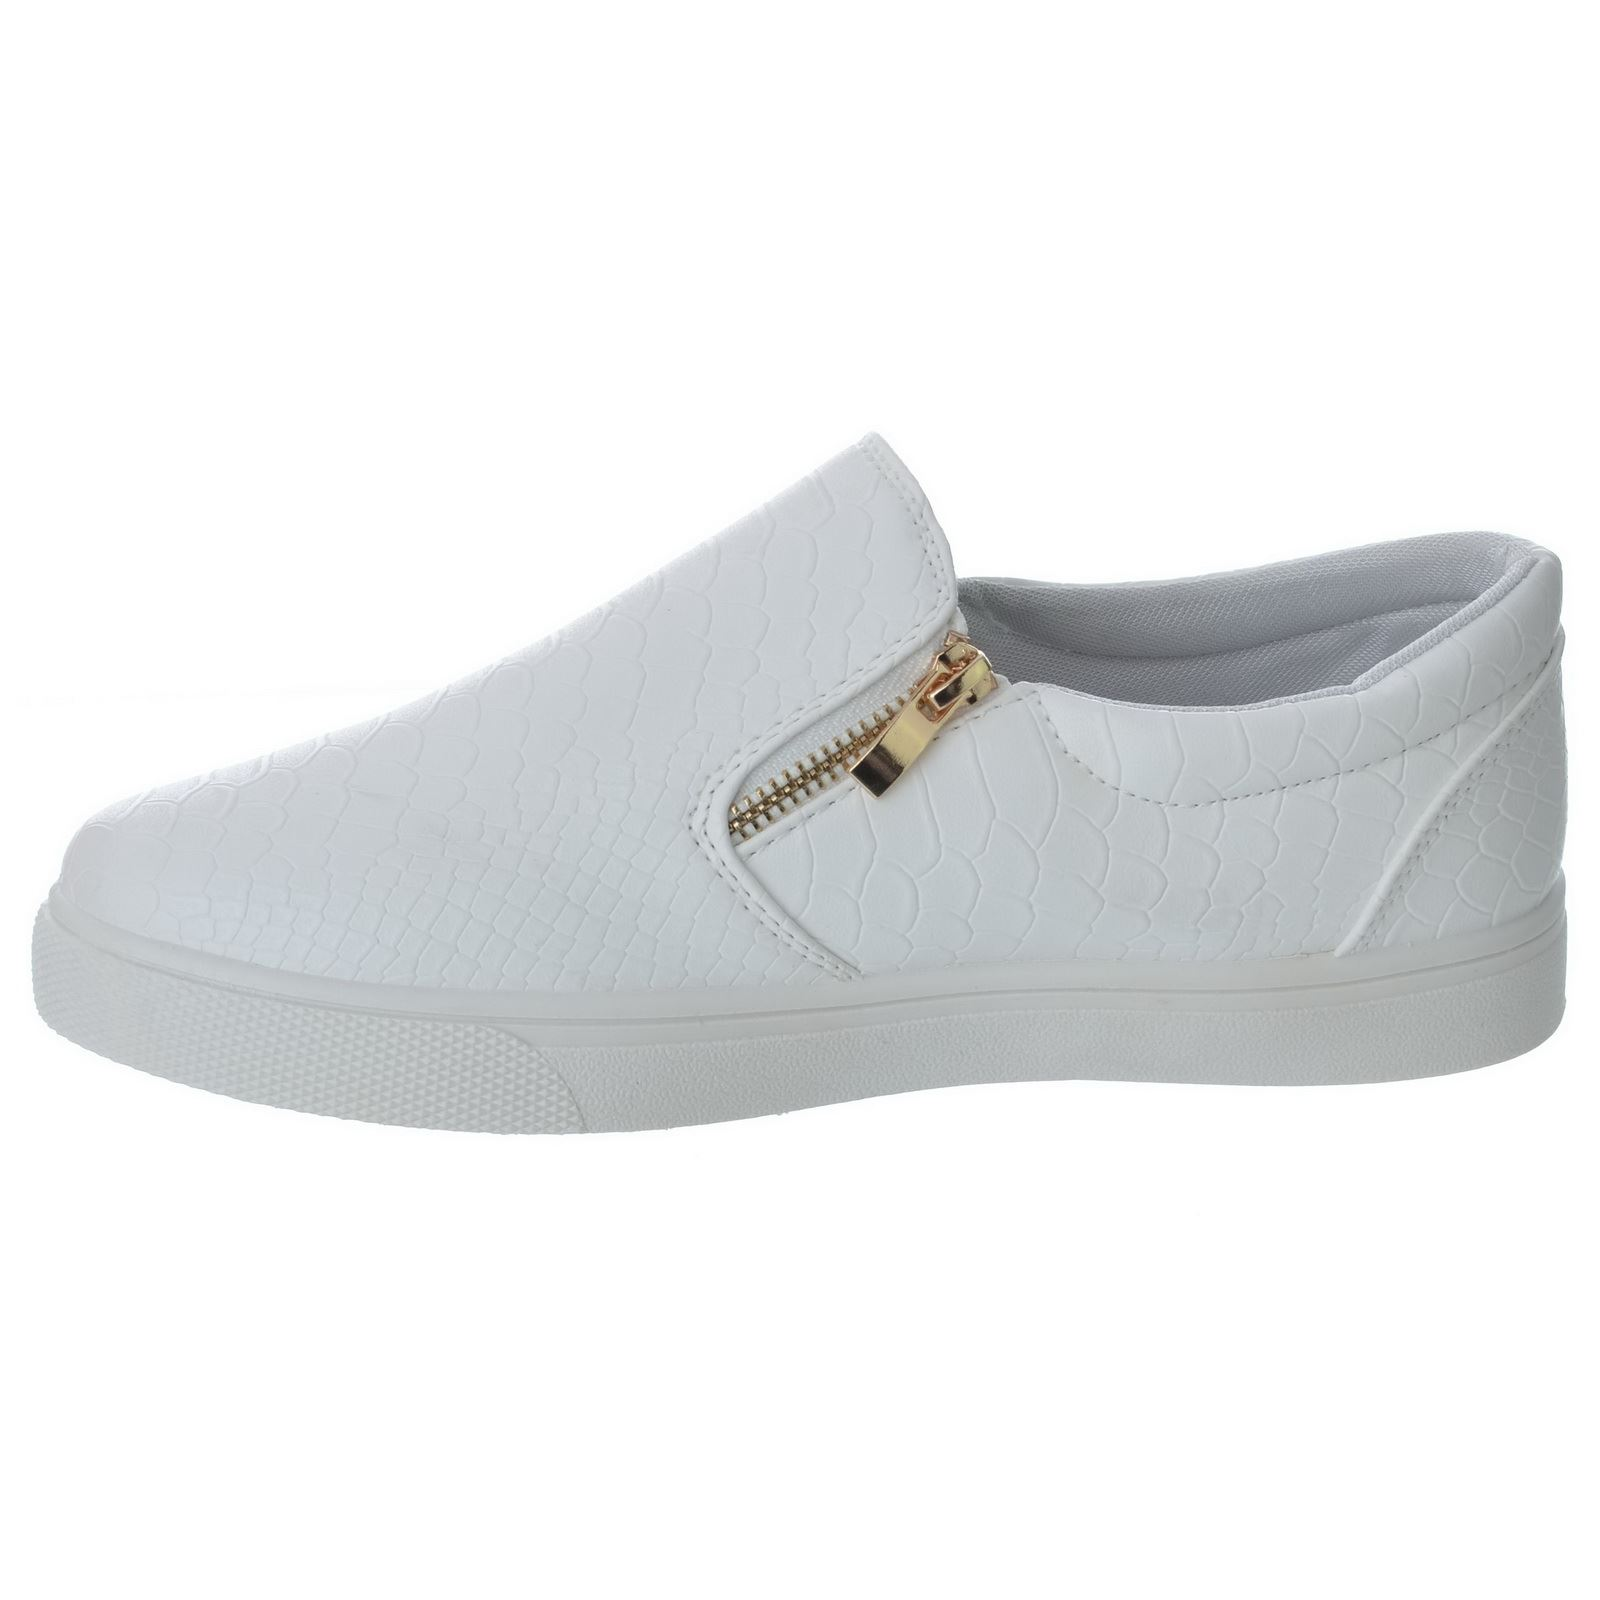 White Skater Shoes Womens